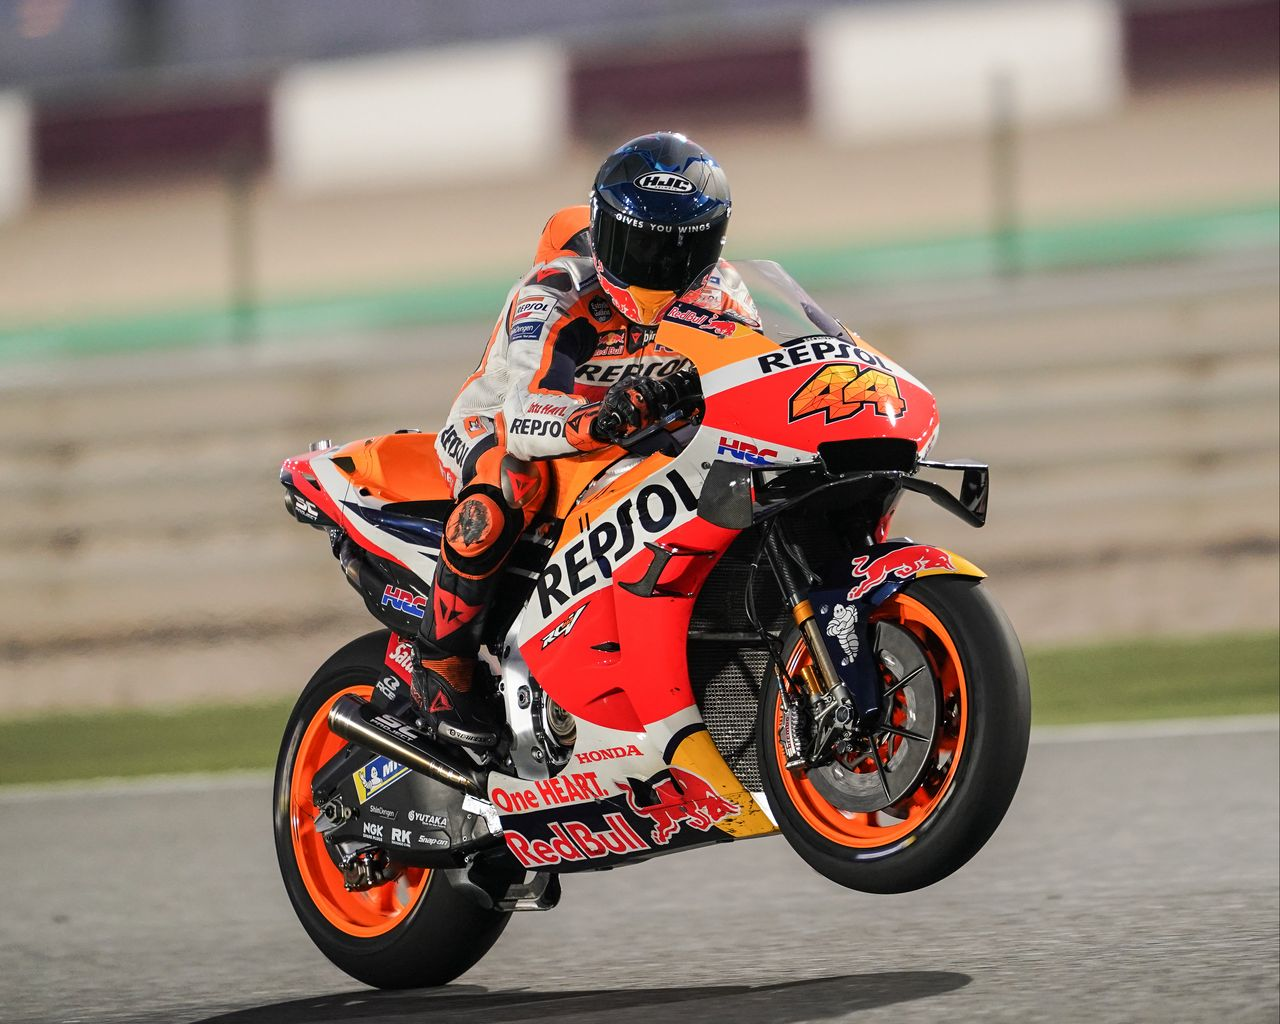 1280x1024 Wallpaper honda, motorcycle, motorcyclist, helmet, speed, track, orange